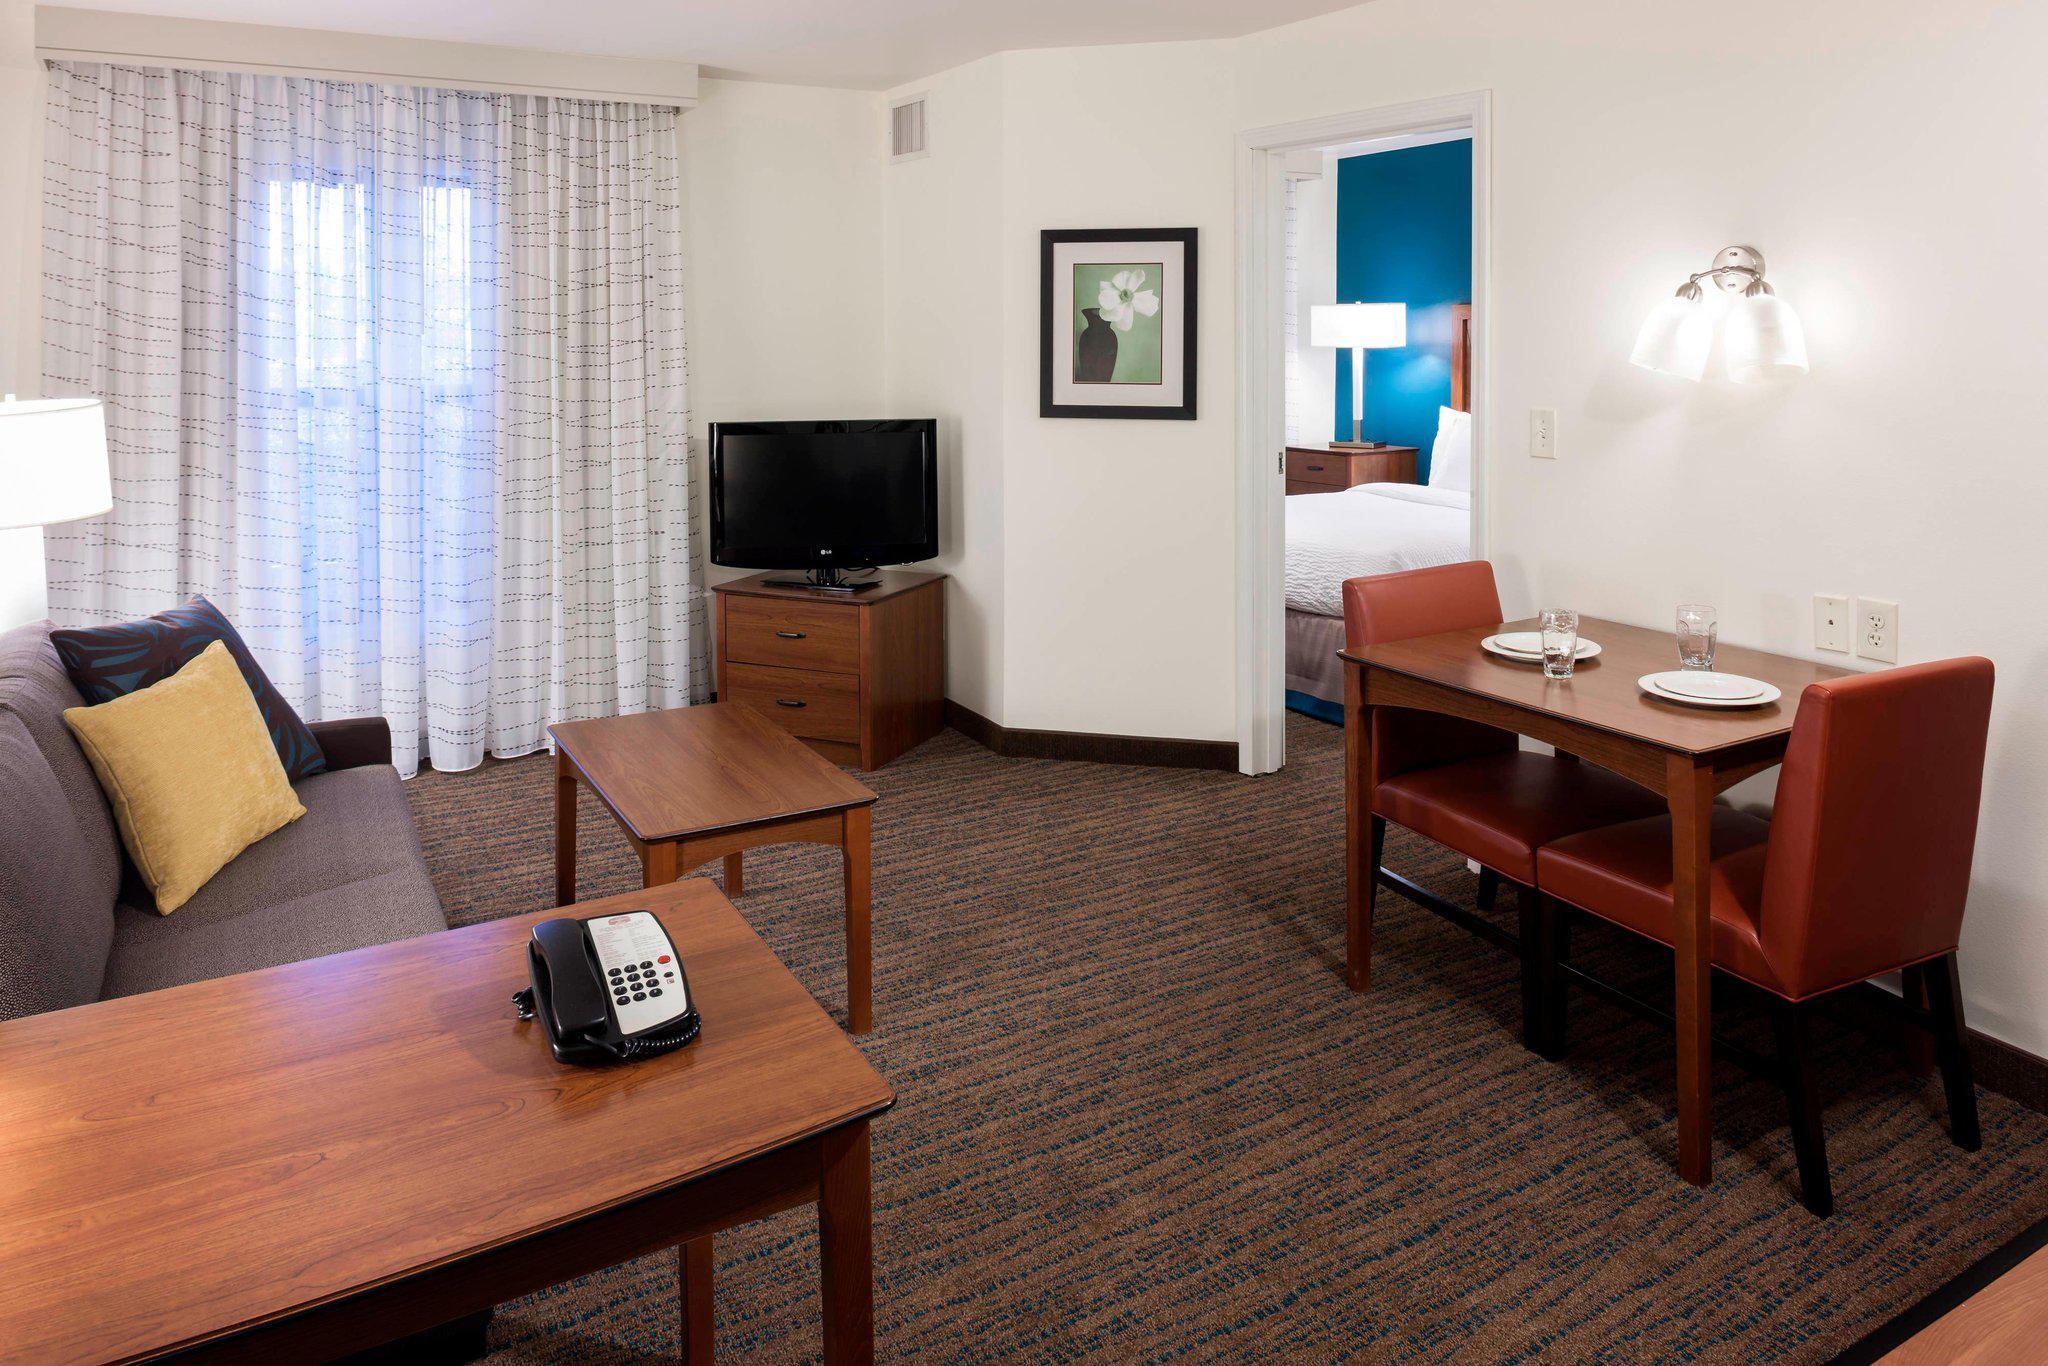 Residence Inn by Marriott Manassas Battlefield Park